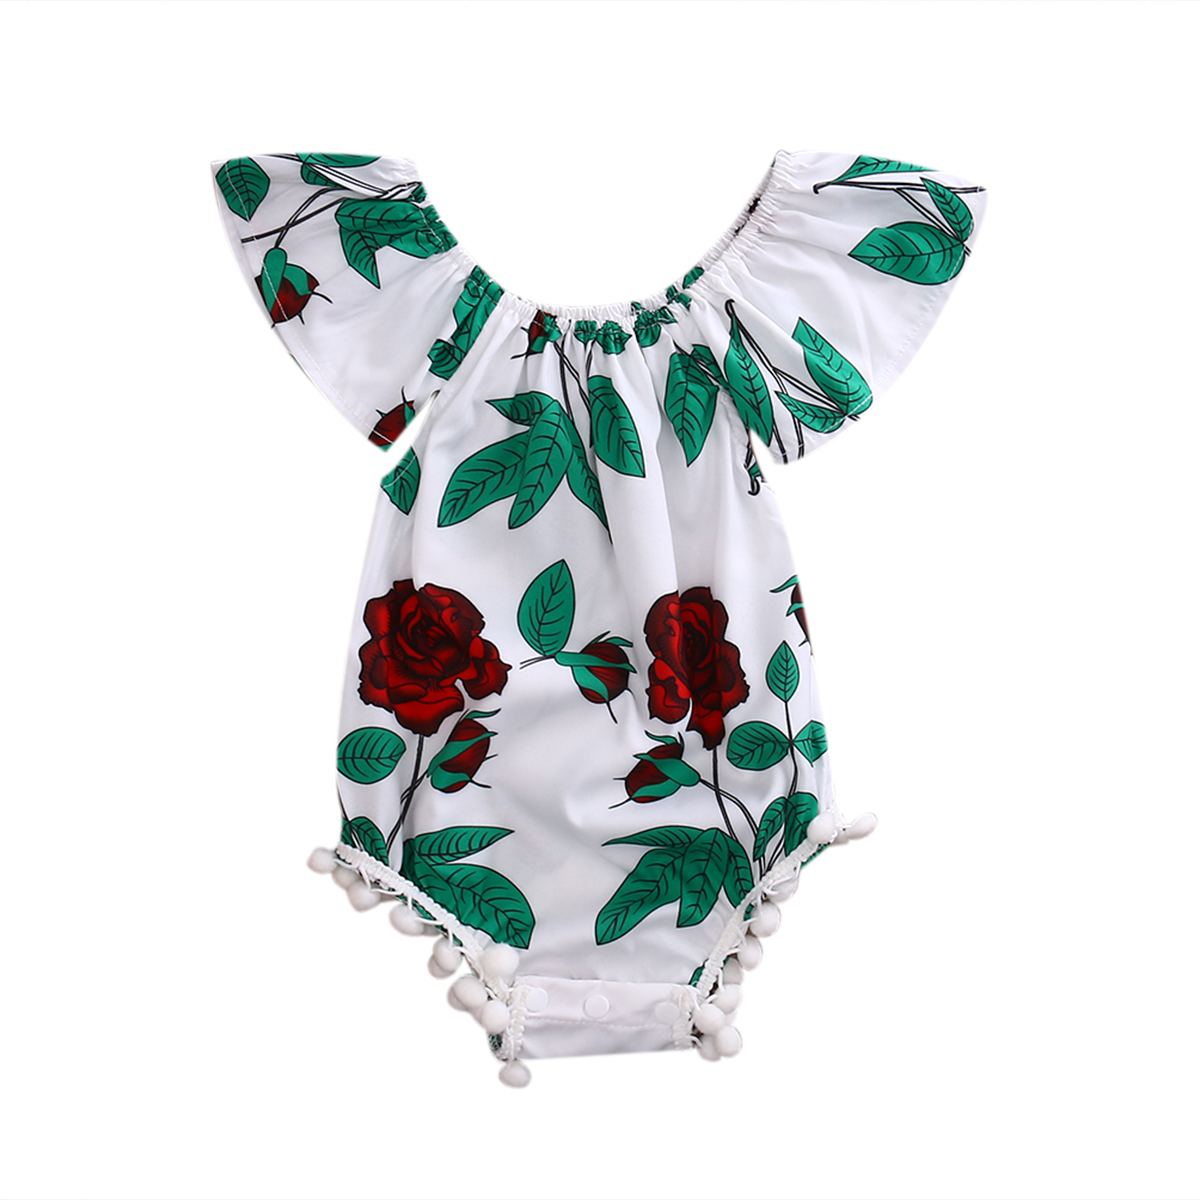 Summer Newborn Toddler Baby Kids Girl Floral Romper Jumpsuit Sunsuit Cotton One-Piece Clothes